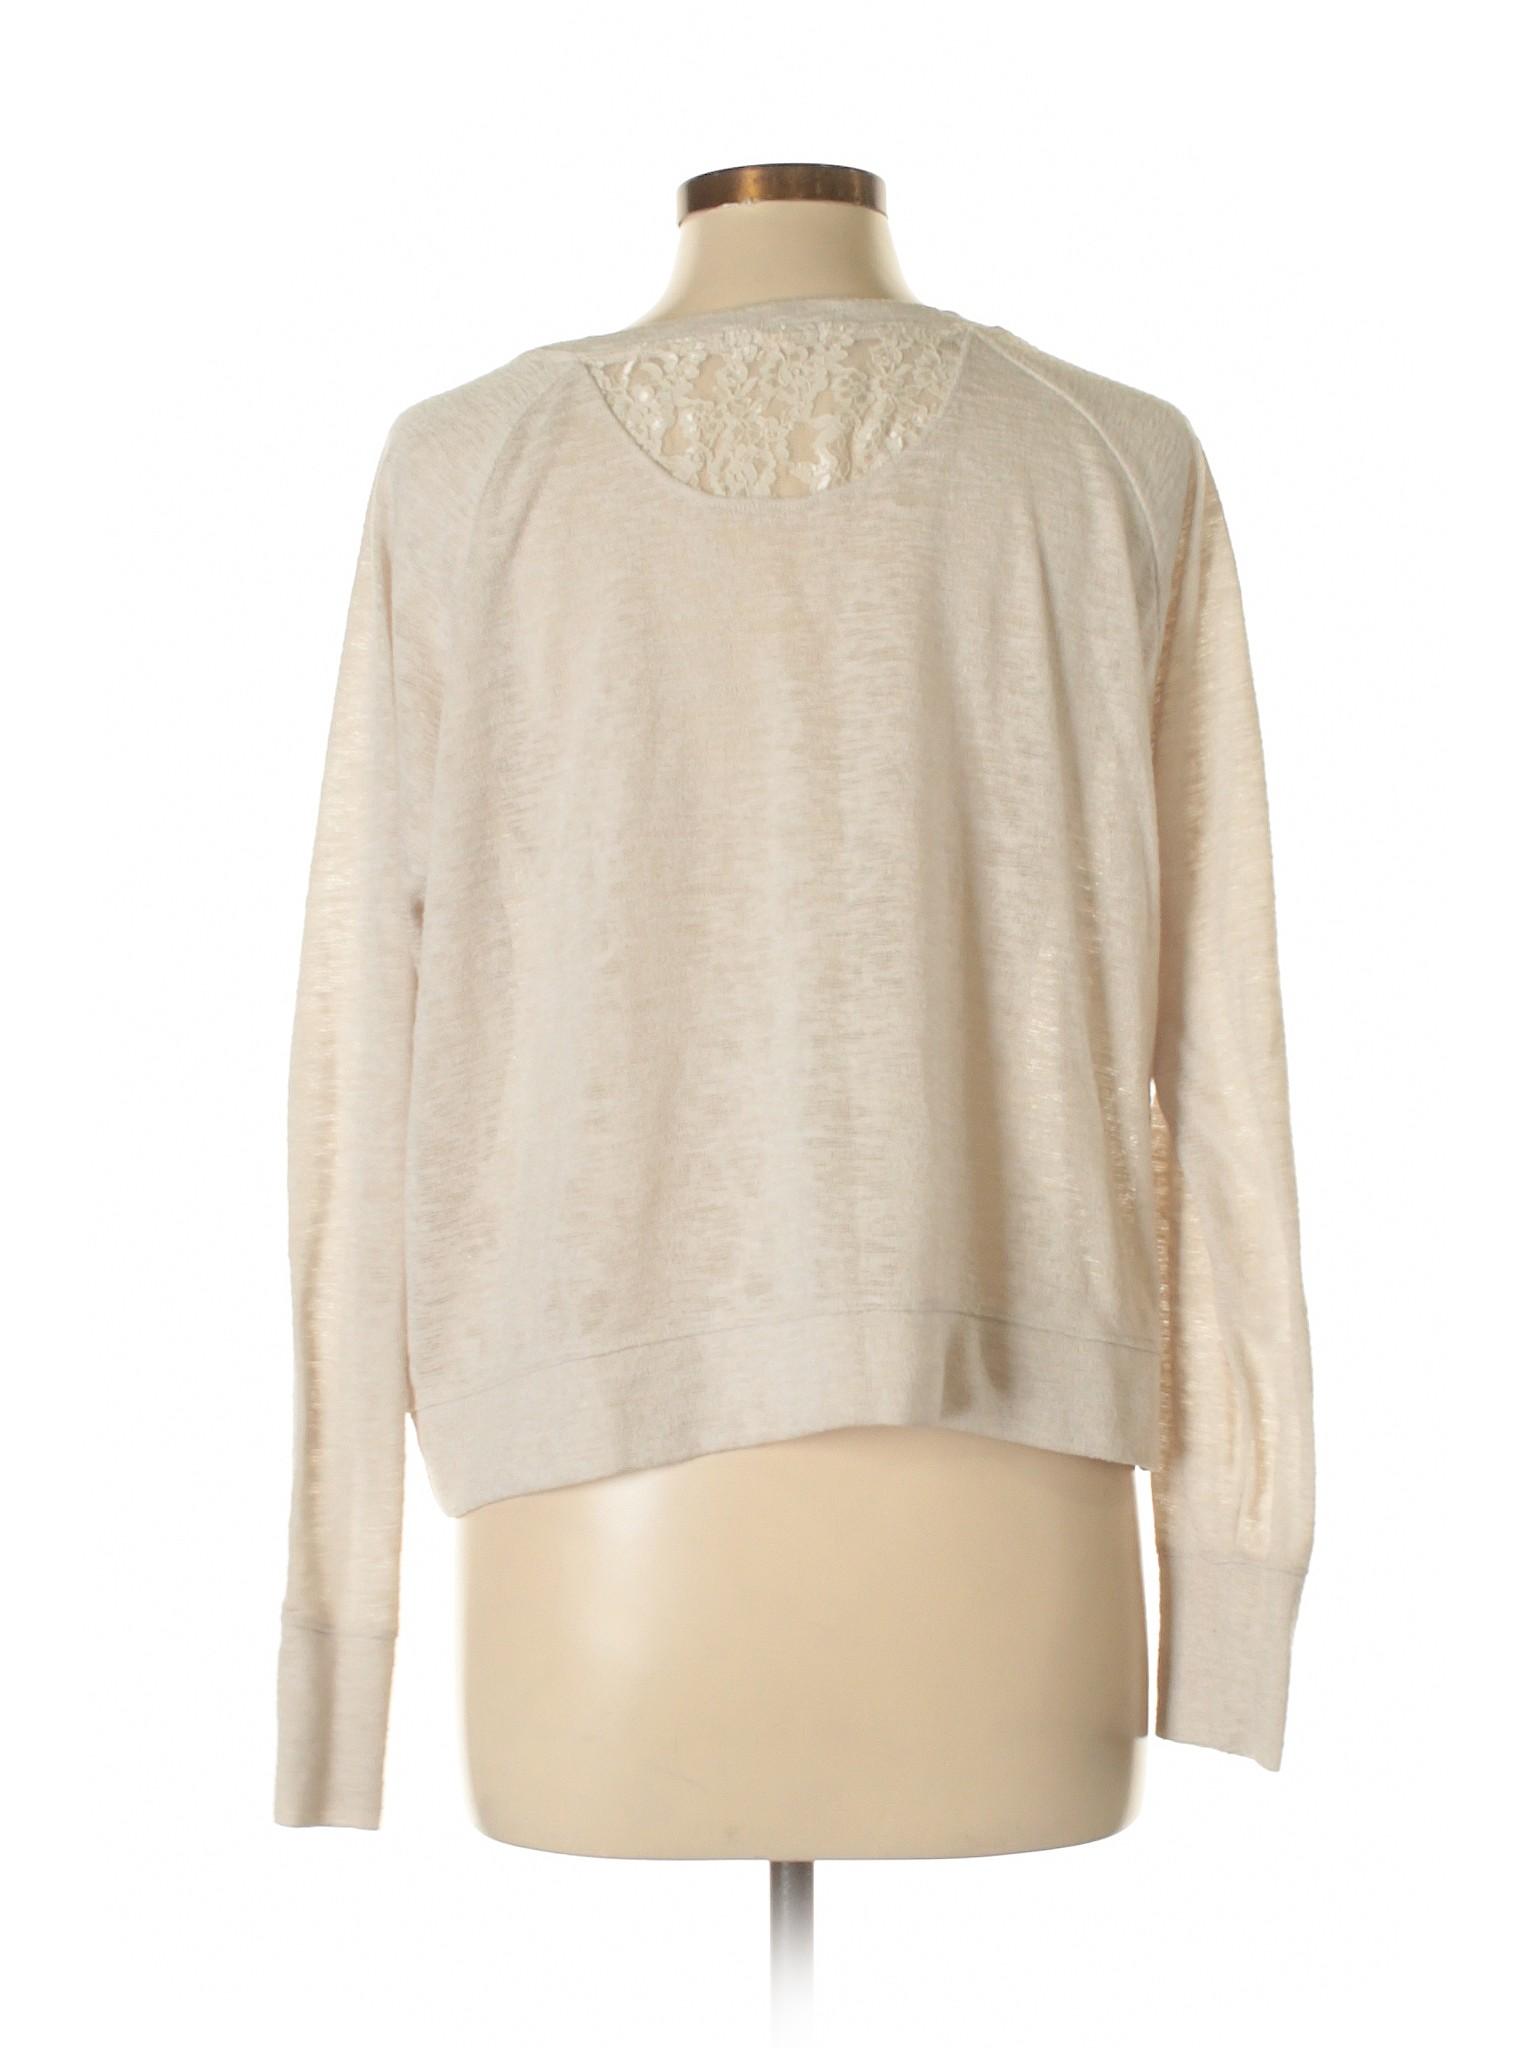 Secret Secret Boutique Victoria's Pullover Sweater Boutique Victoria's w1IqZx